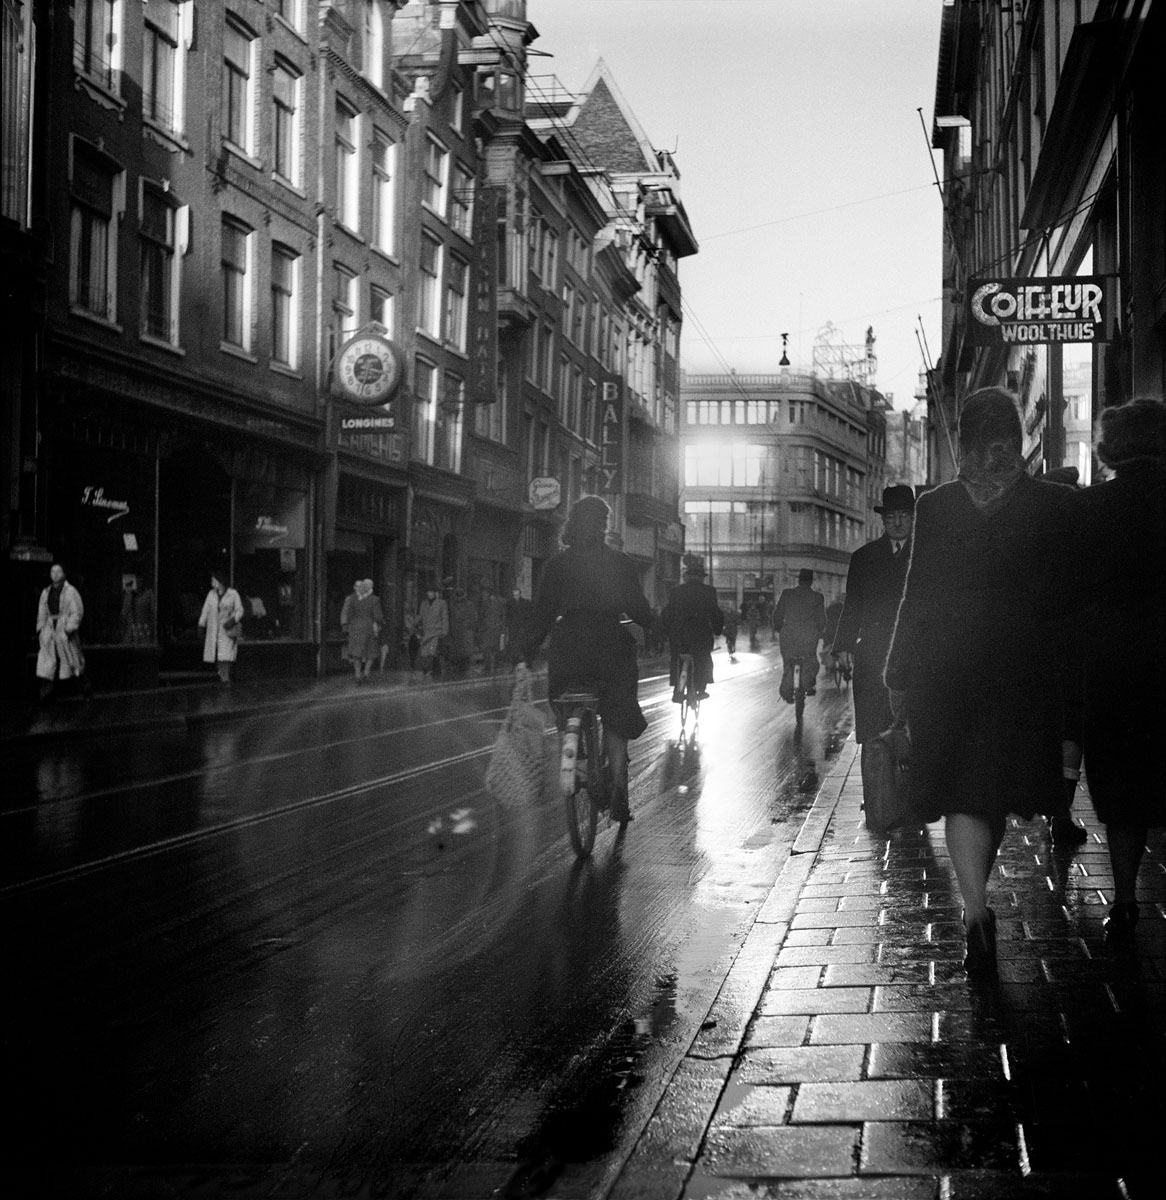 foto van Werner Bischof van de Leidsestraat in Amsterdam in 1945 met fietsers